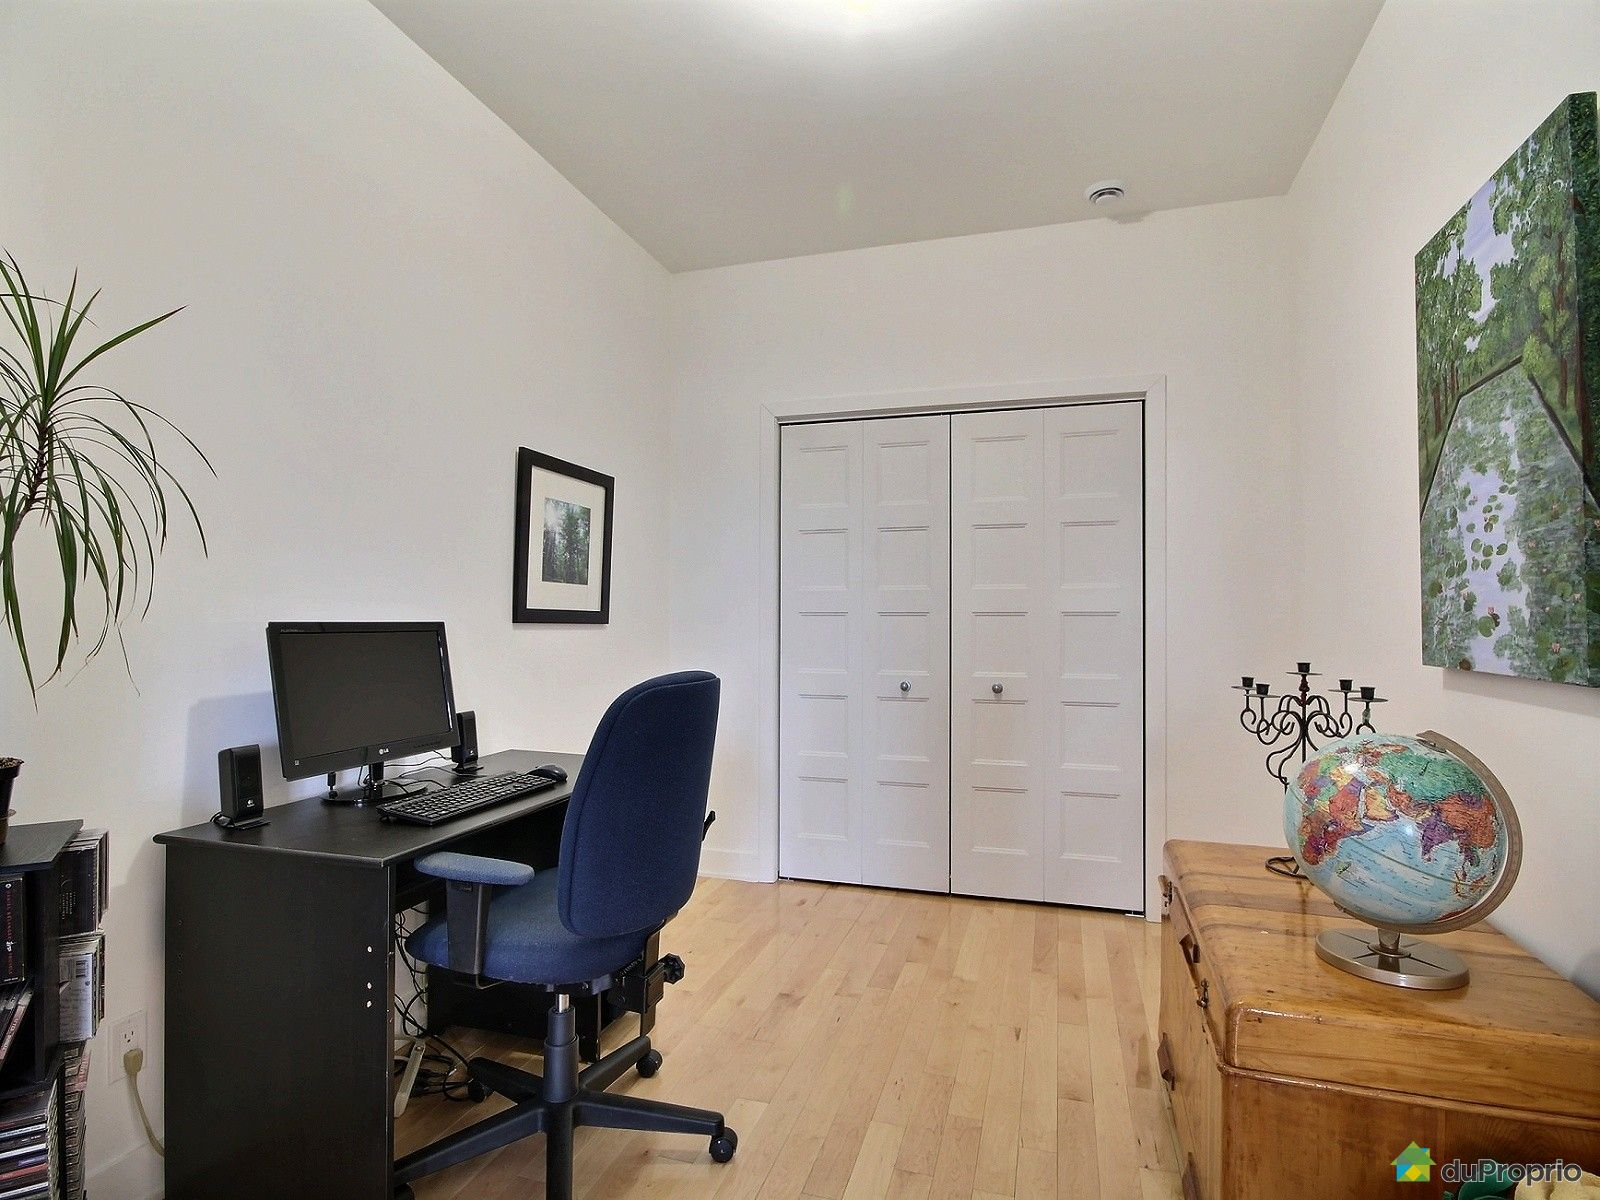 condo vendu montr al immobilier qu bec duproprio 604610. Black Bedroom Furniture Sets. Home Design Ideas